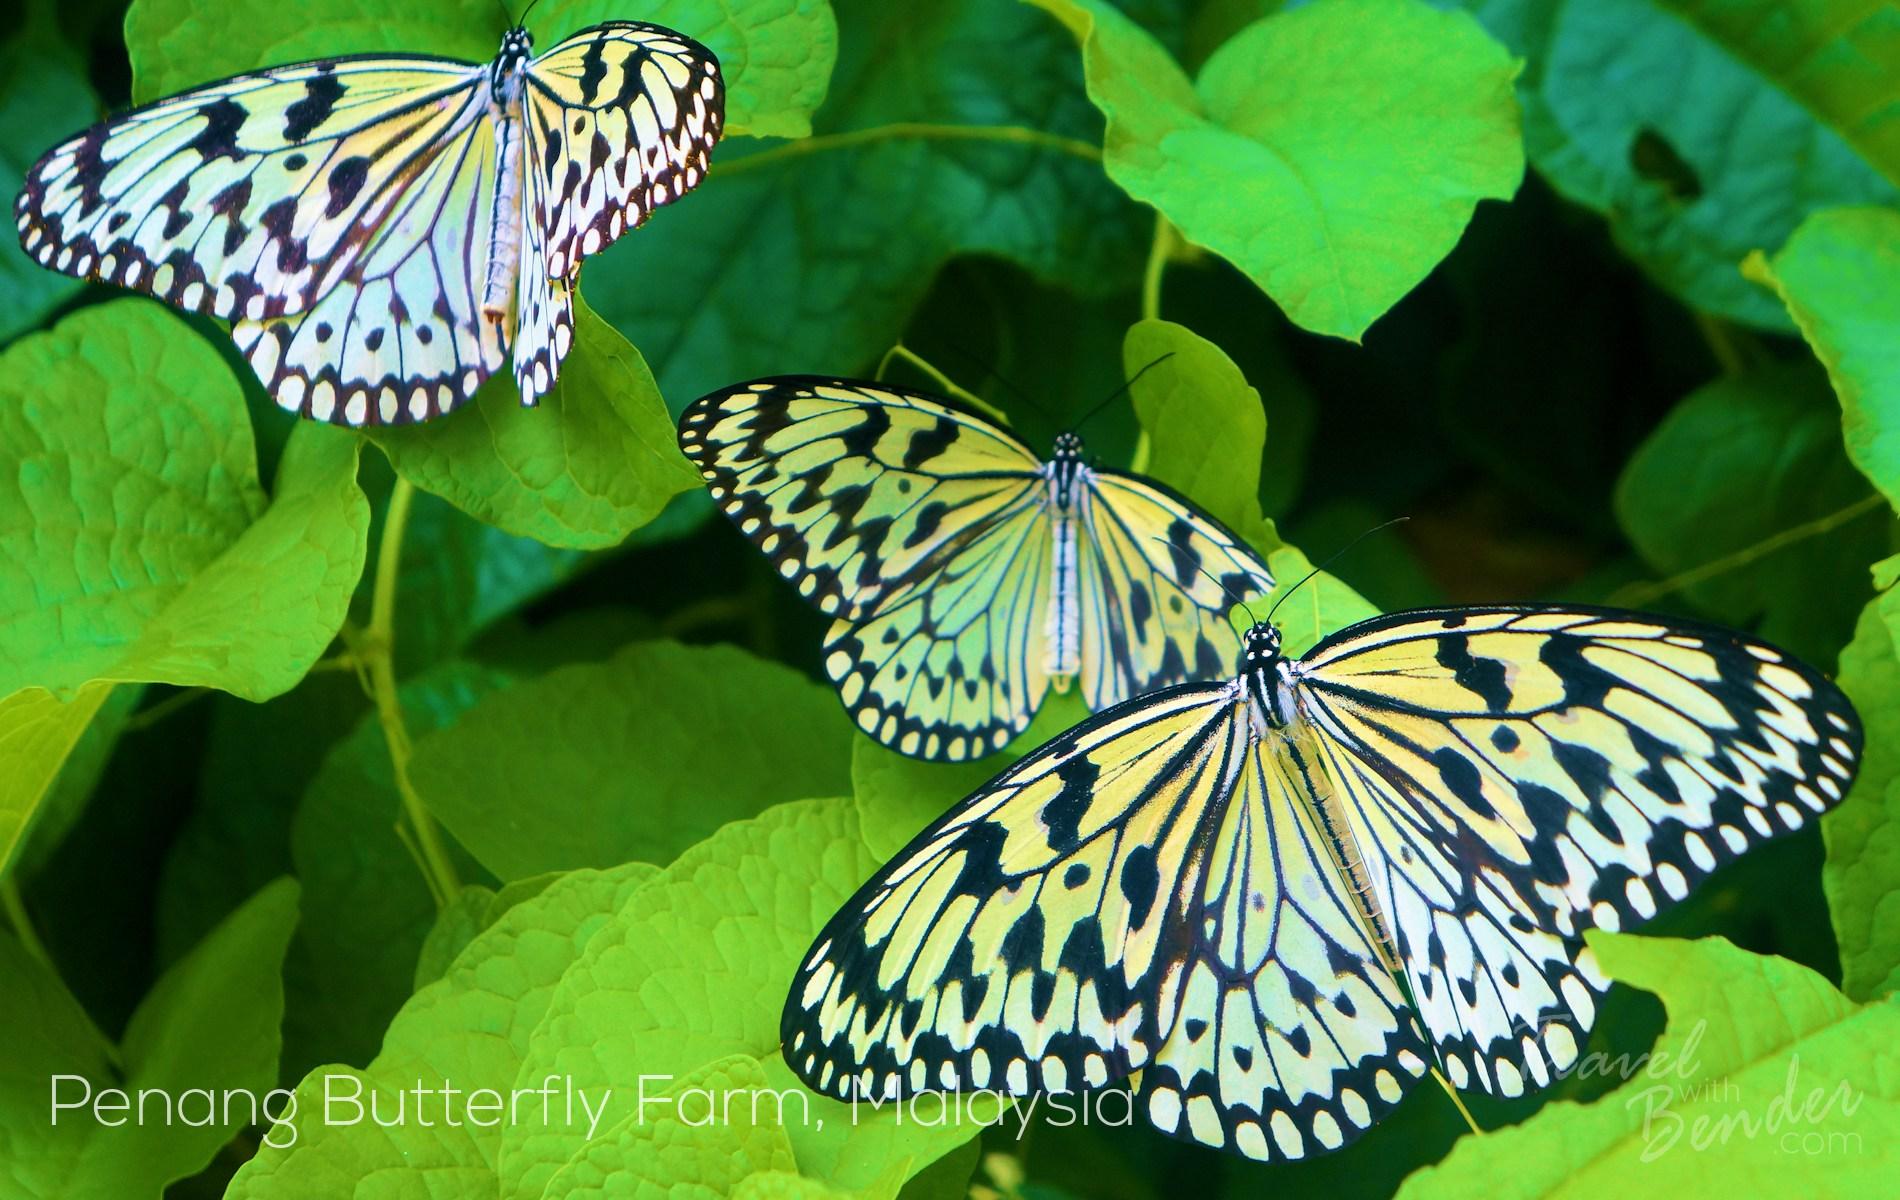 Spice Farm Penang Penang Butterfly Farm